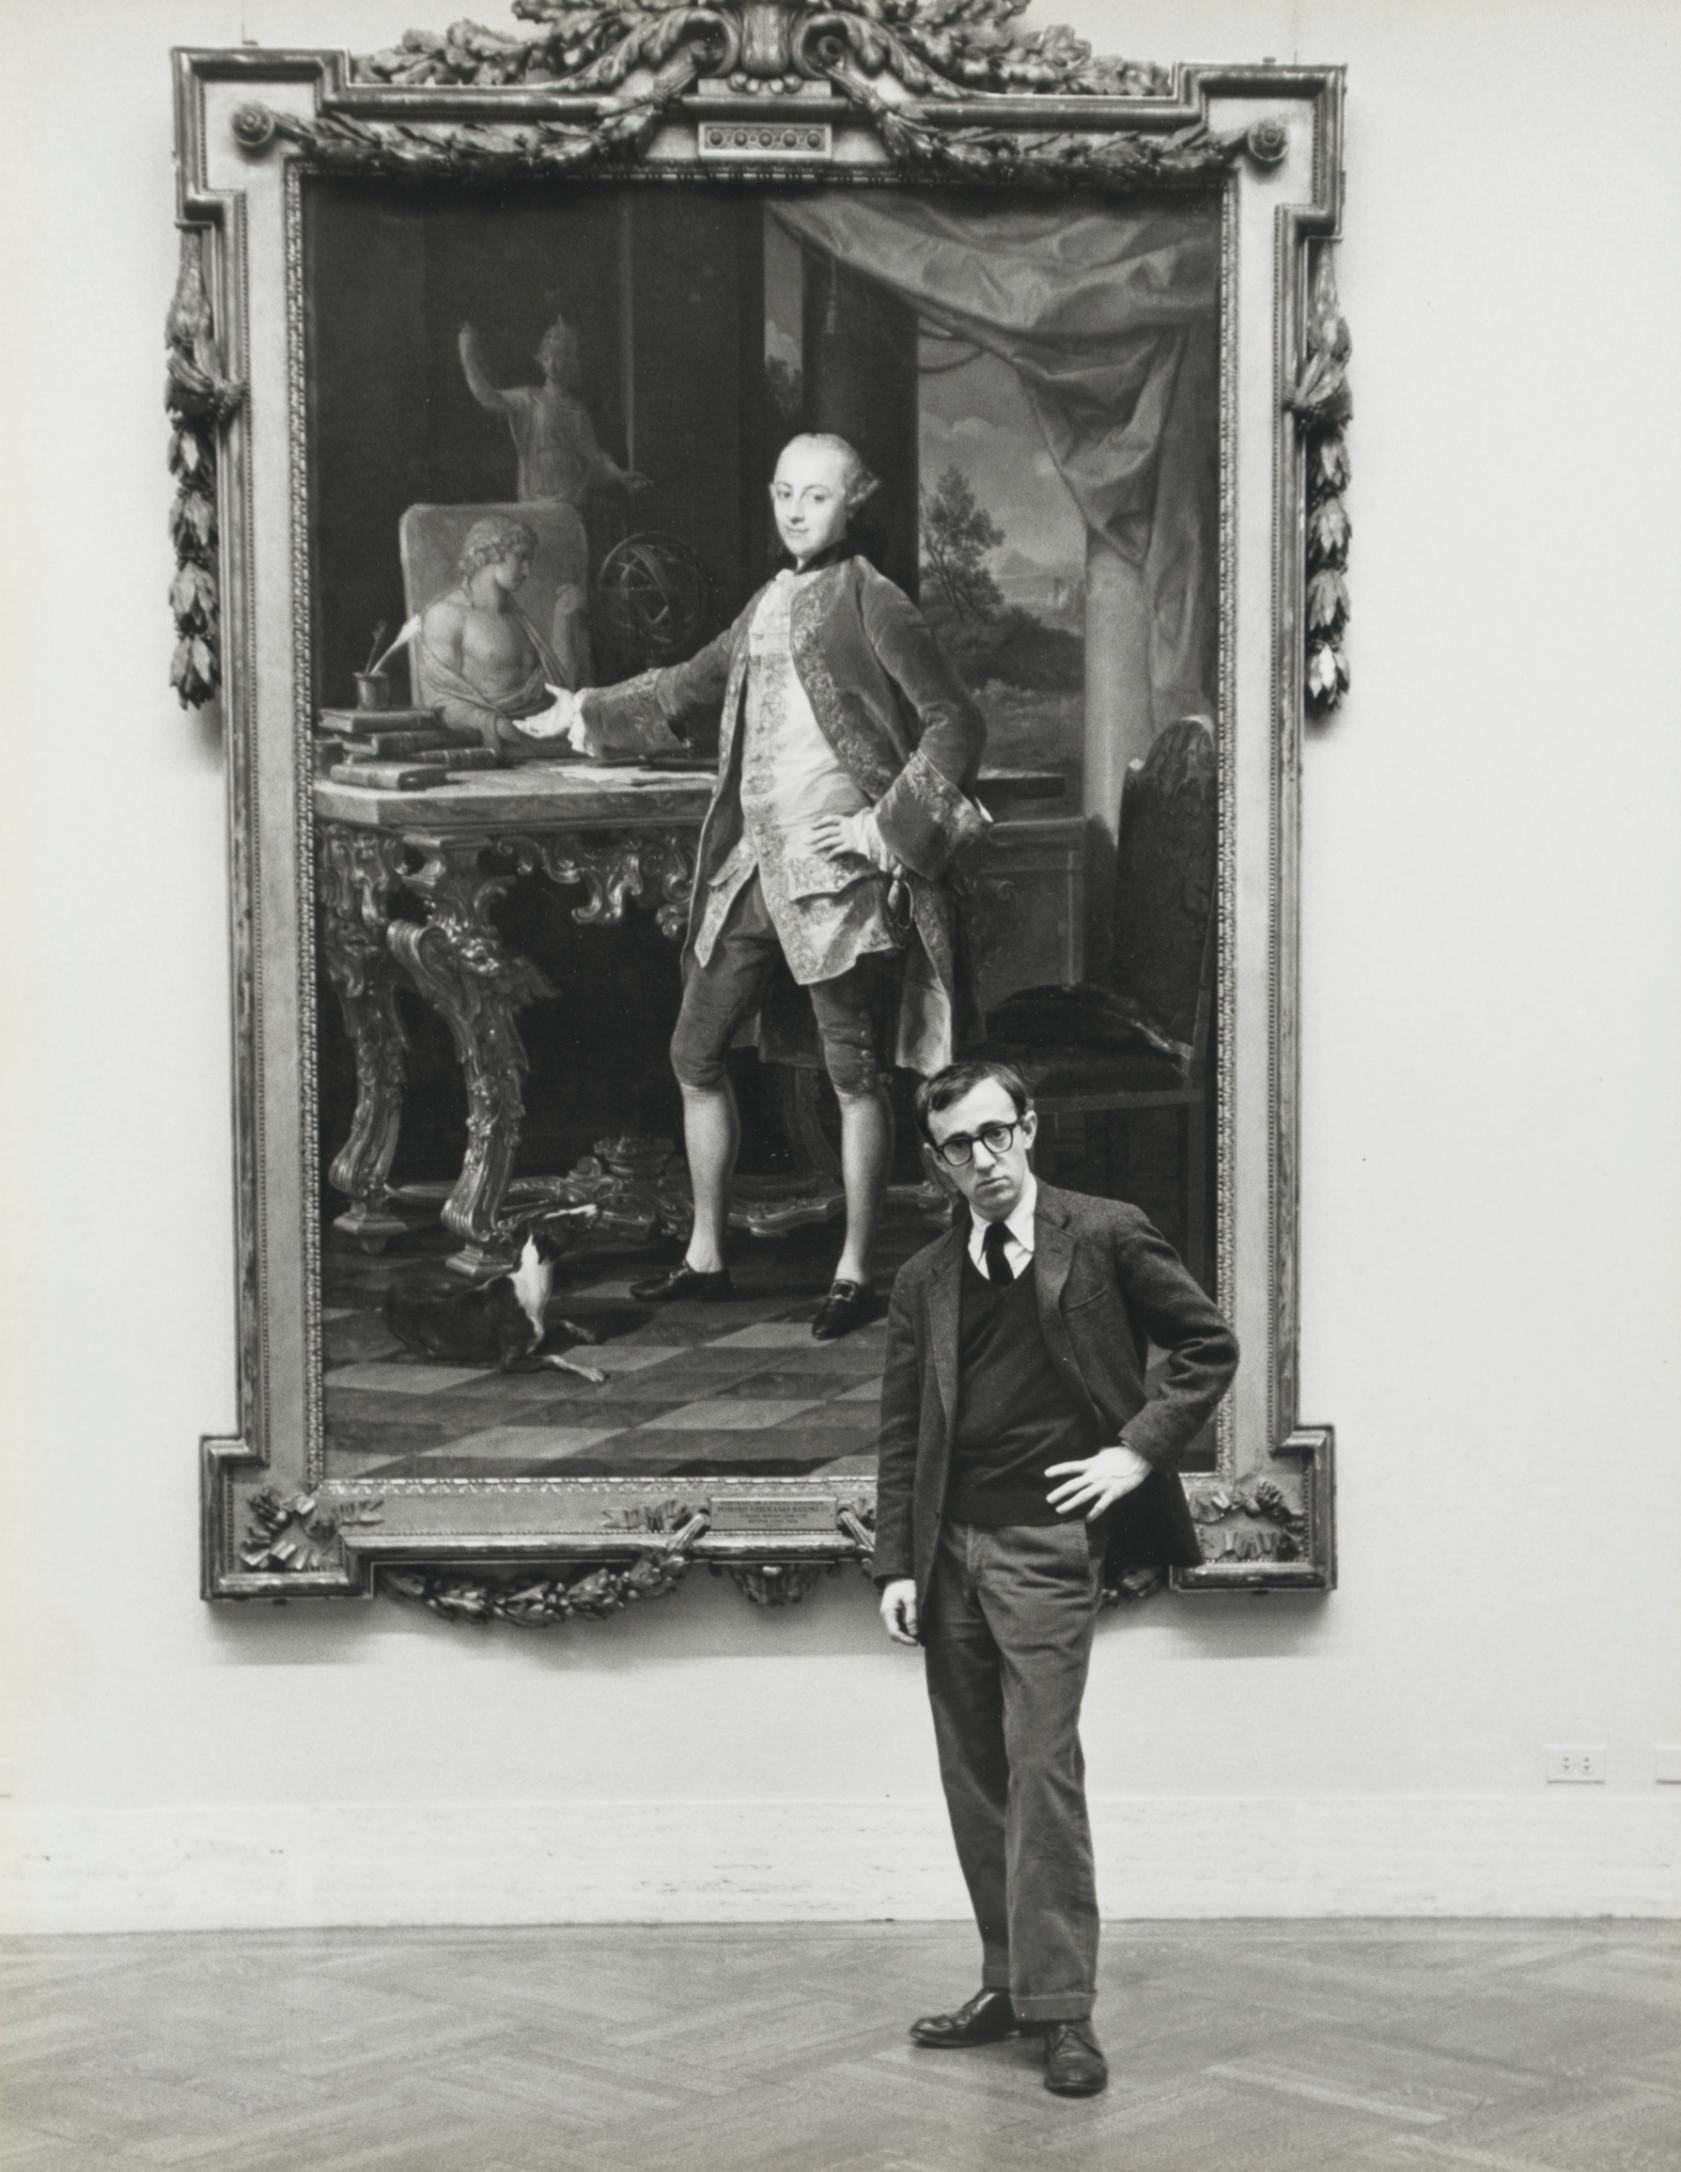 Woody Allen at the Metropolitan Museum, New York, 1963